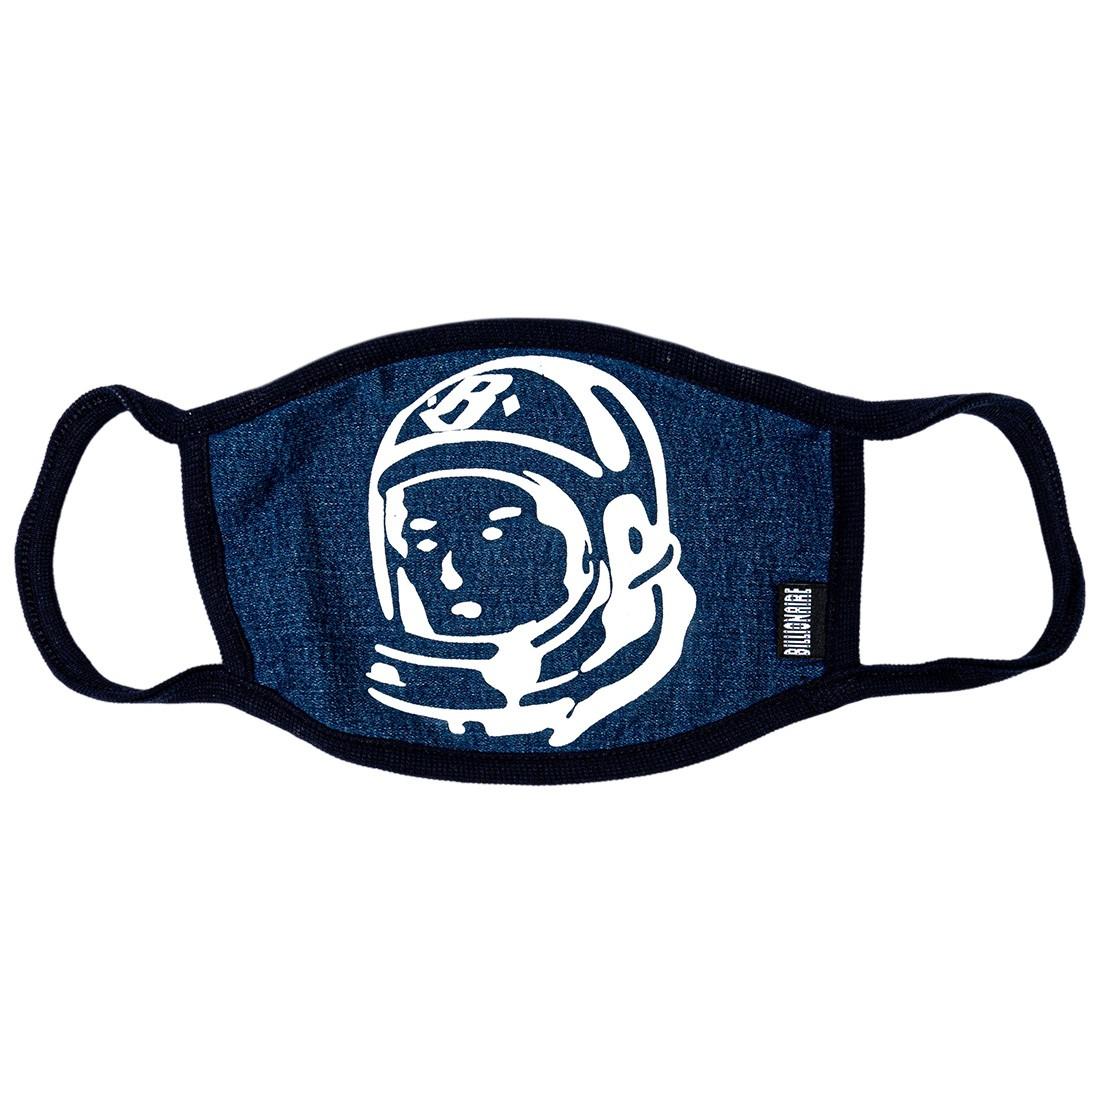 Billionaire Boys Club Denim Helmet Mask (blue / jean)